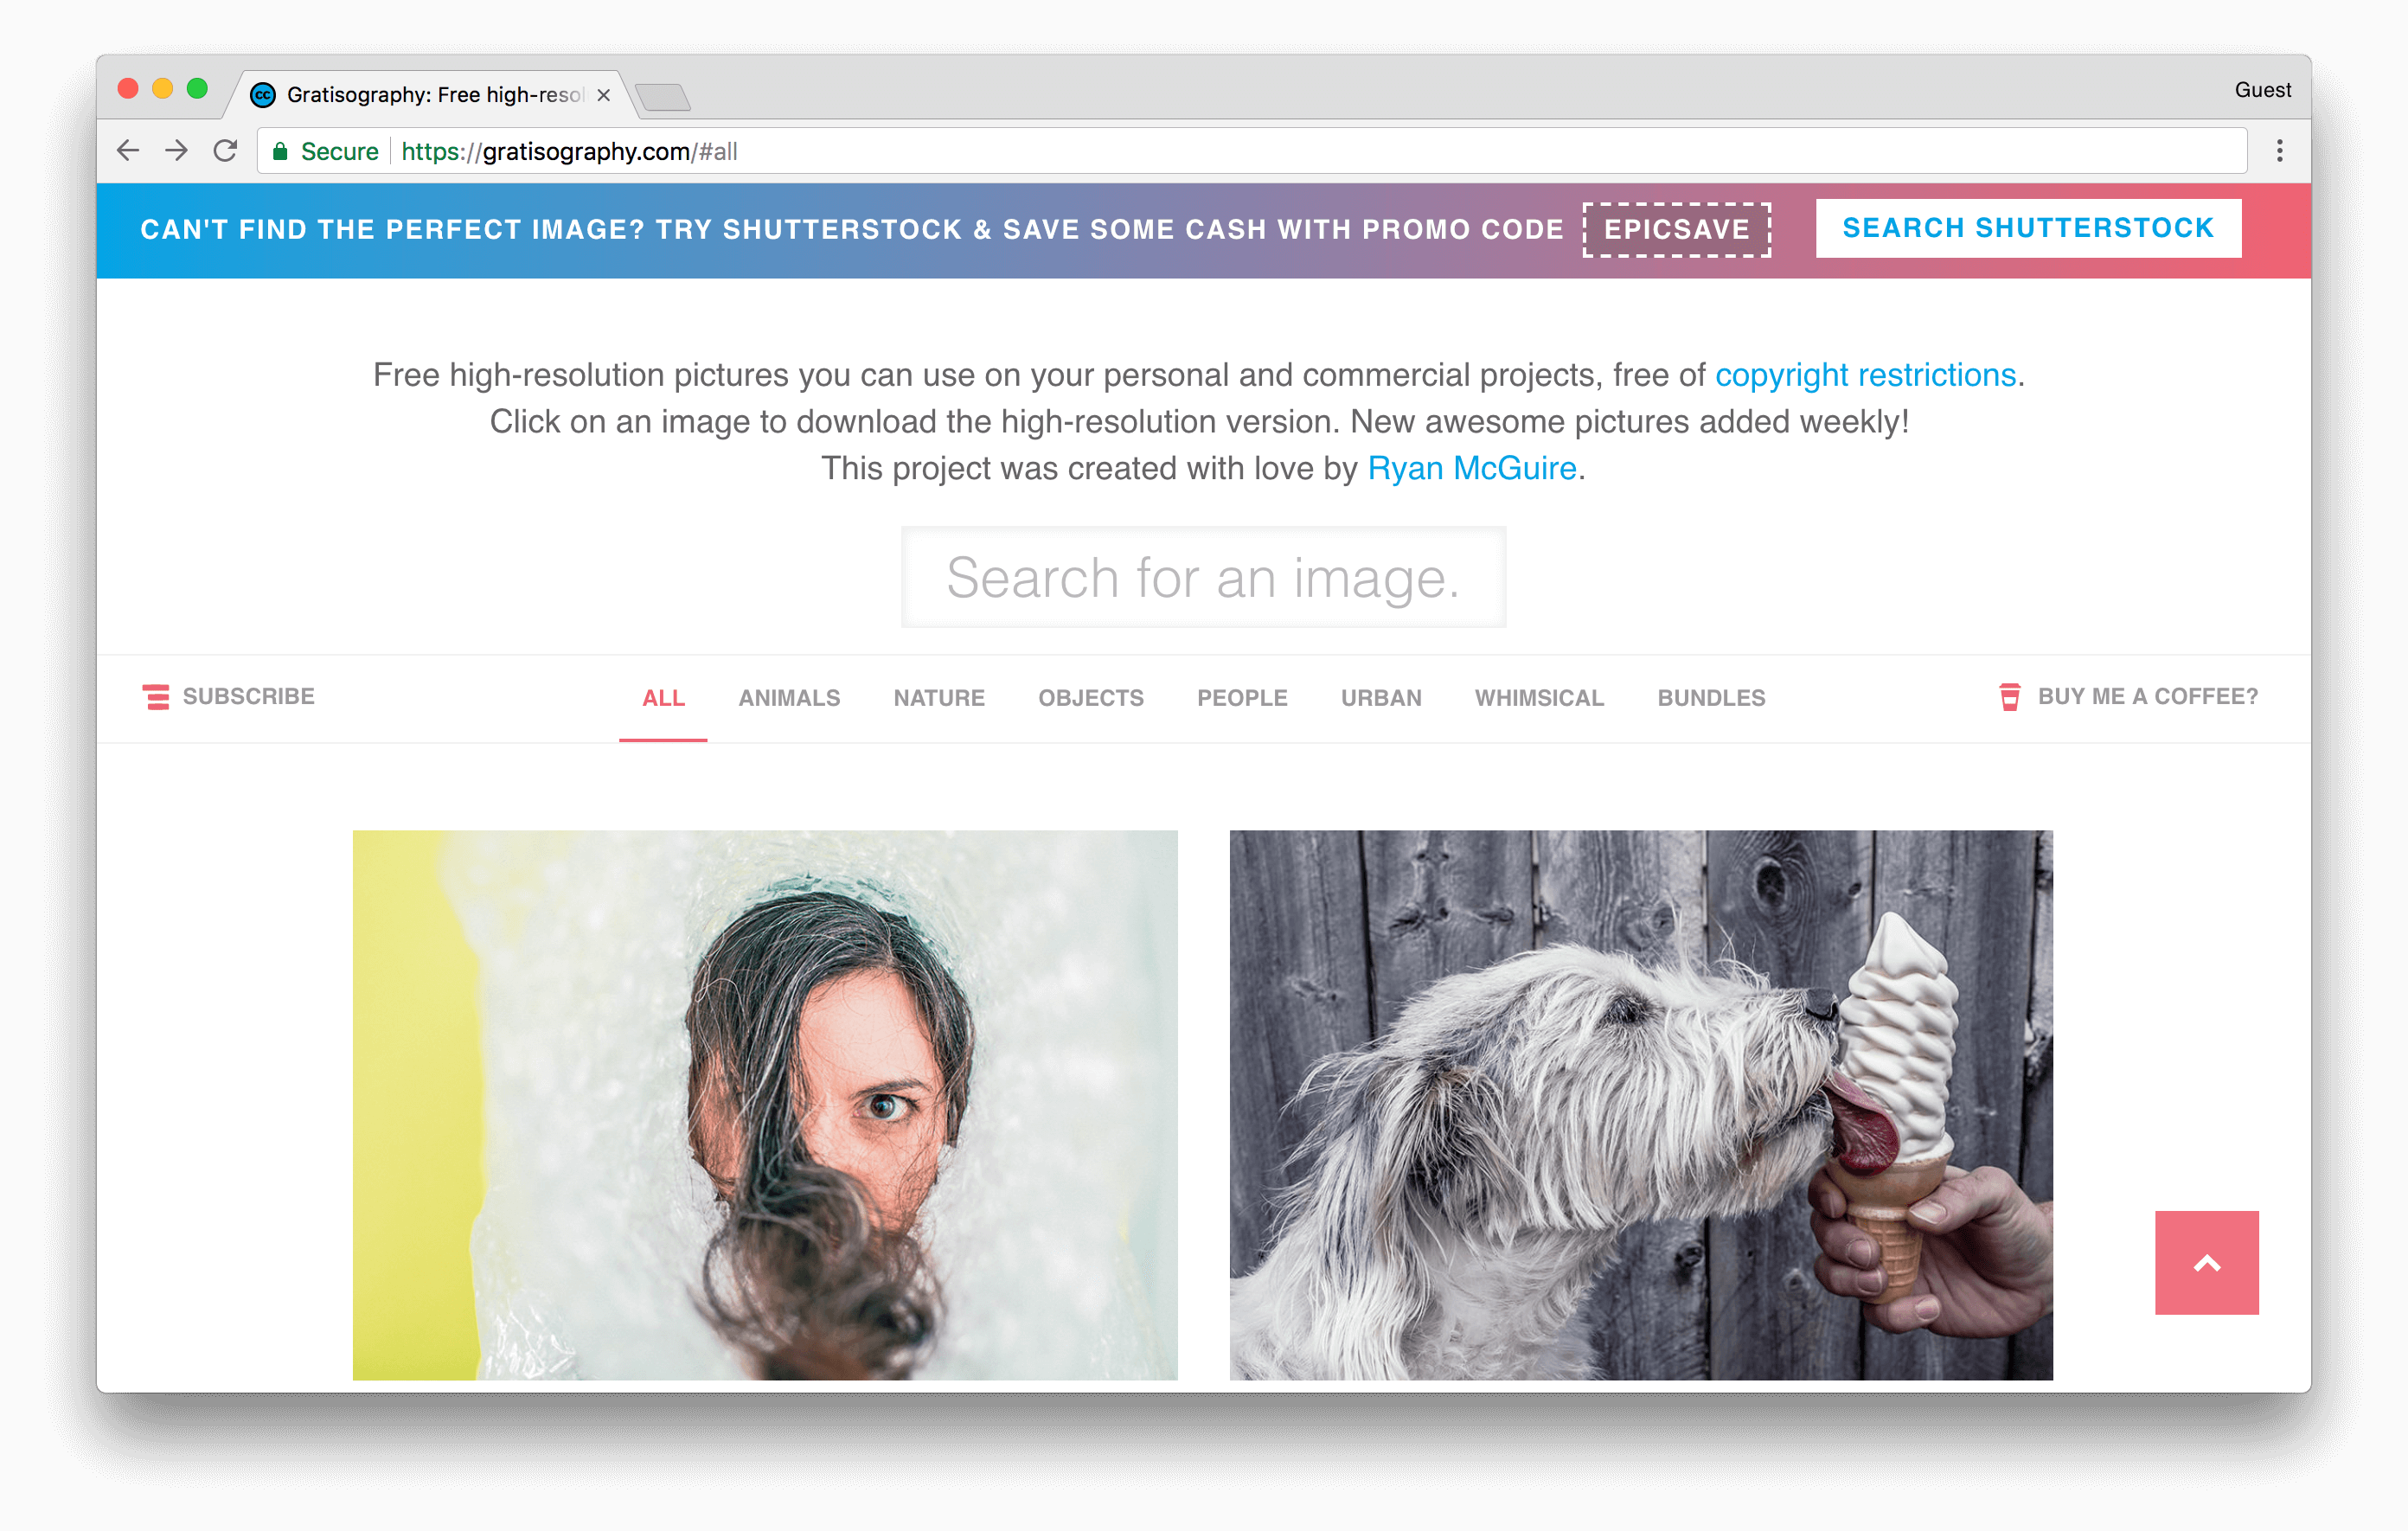 gratisography.com